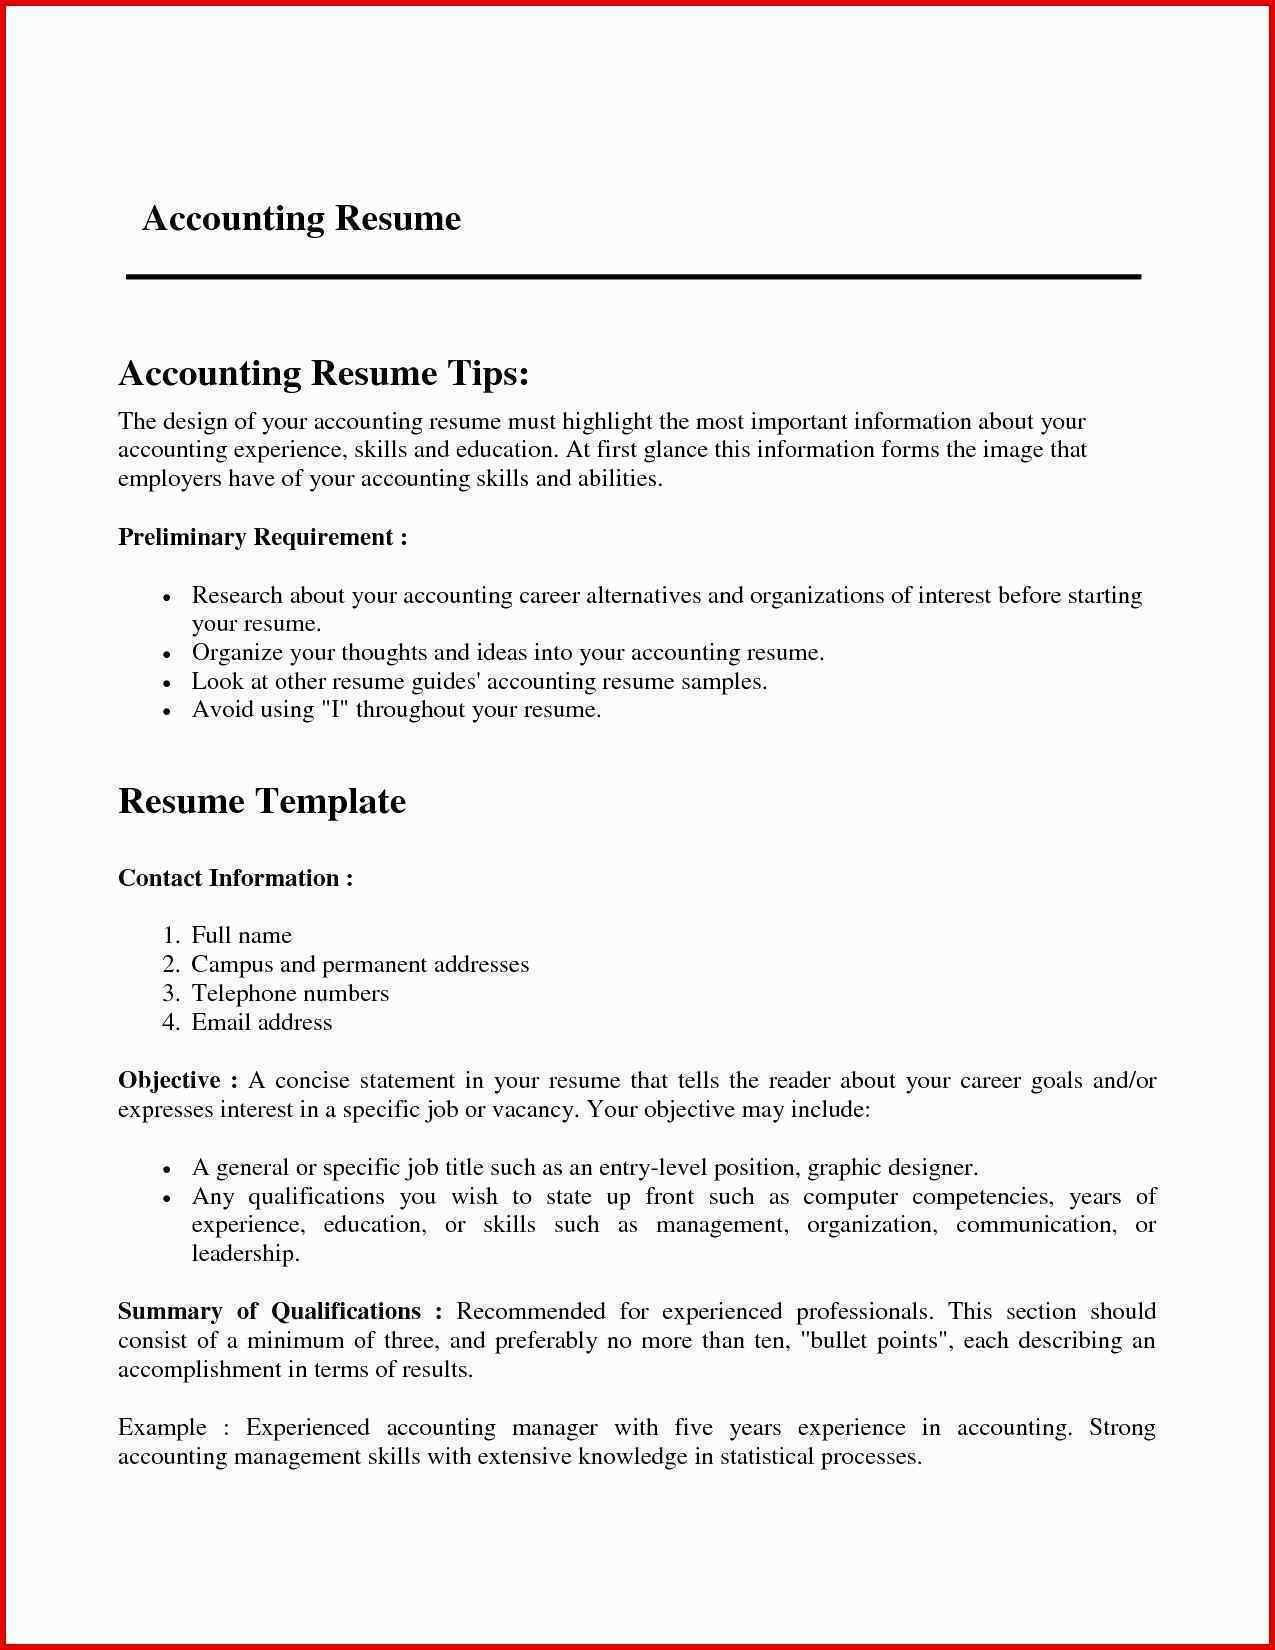 3 Year Experience Resume format, Hr resume, Resume